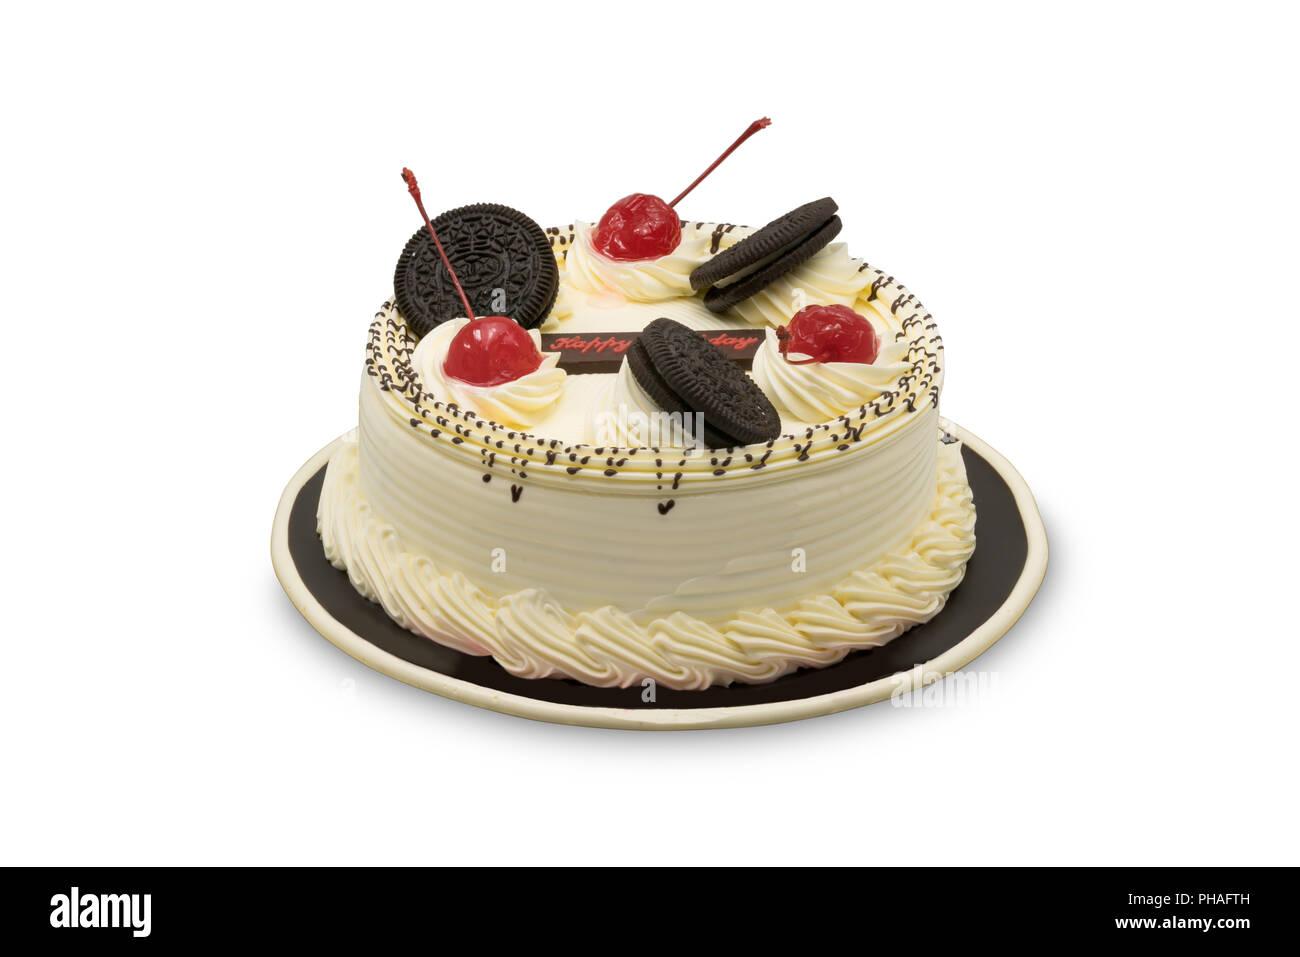 Delicious Birthday Cake Stock Photo 217205537